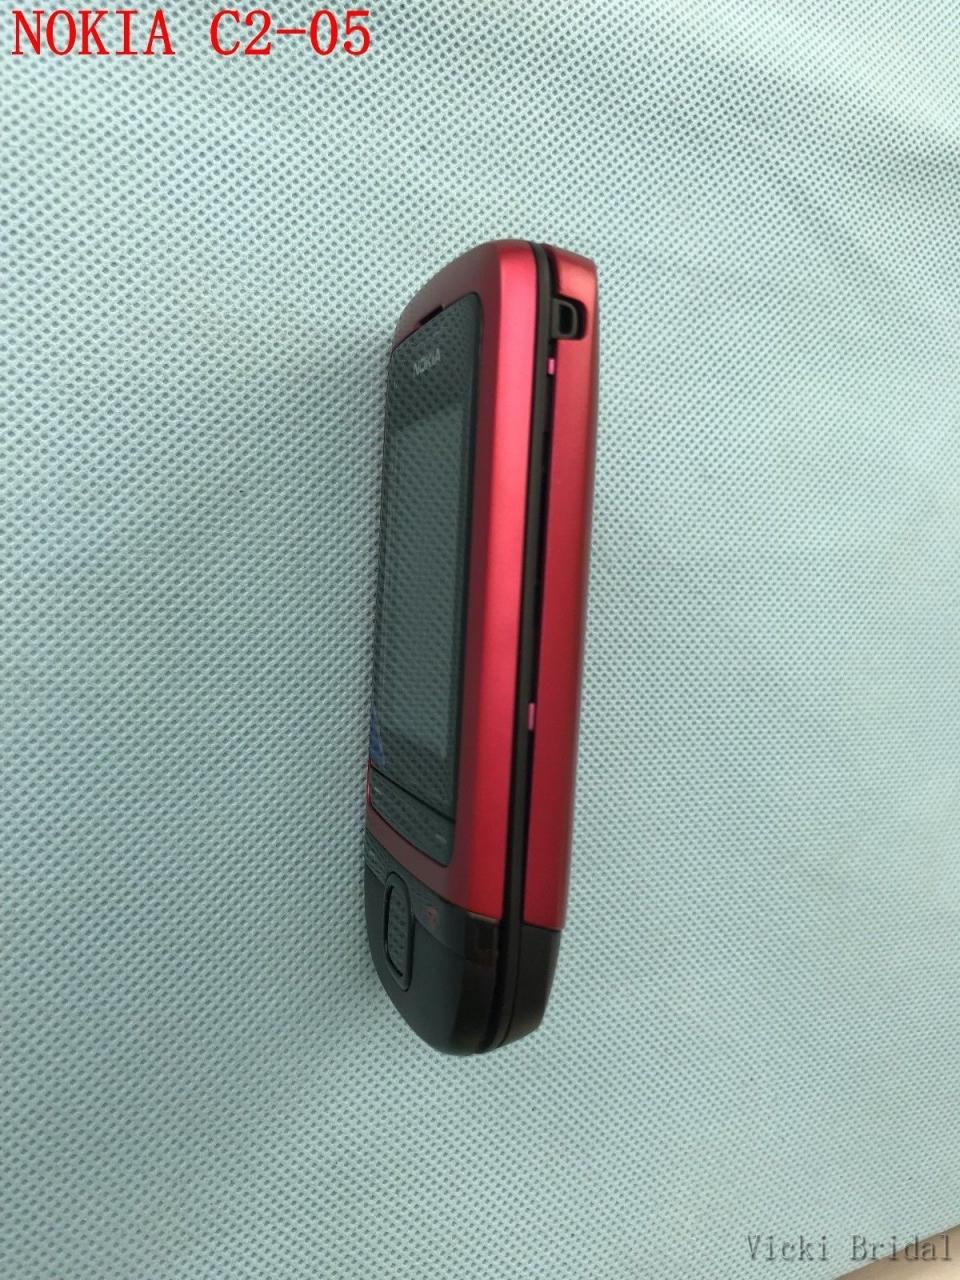 Refurbished phone Original Unlocked Nokia C2-05 slide cell phone Bluetooth phone black 7